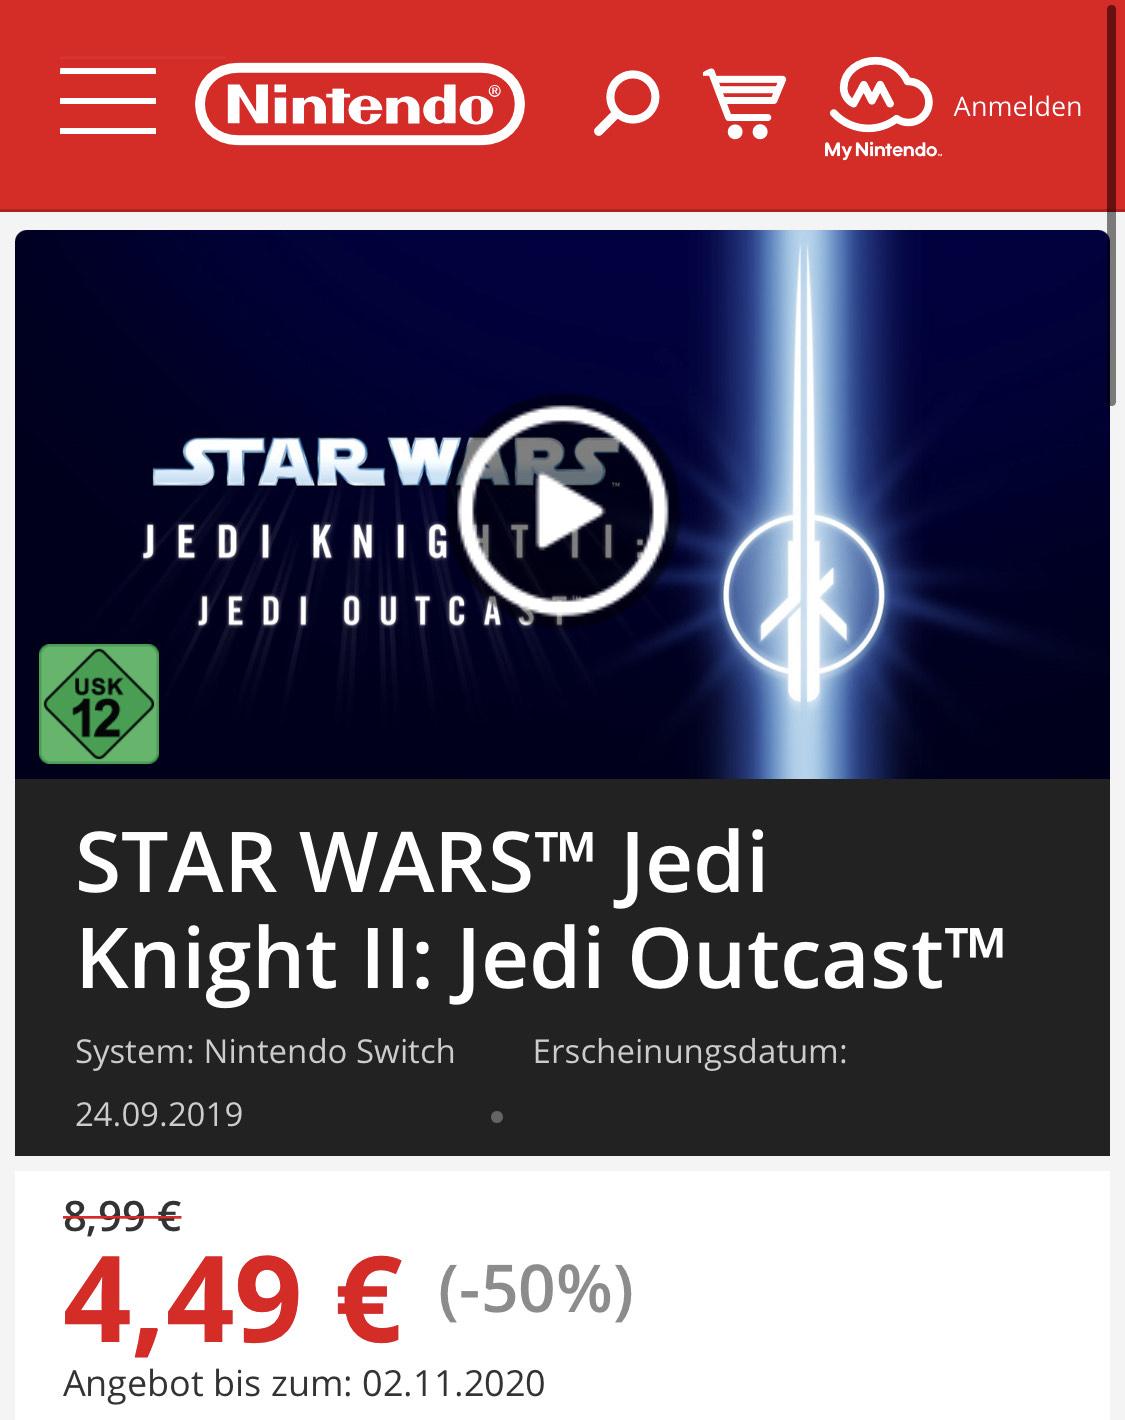 Nintendo.de - STAR WARS™ Jedi Knight II: Jedi Outcast